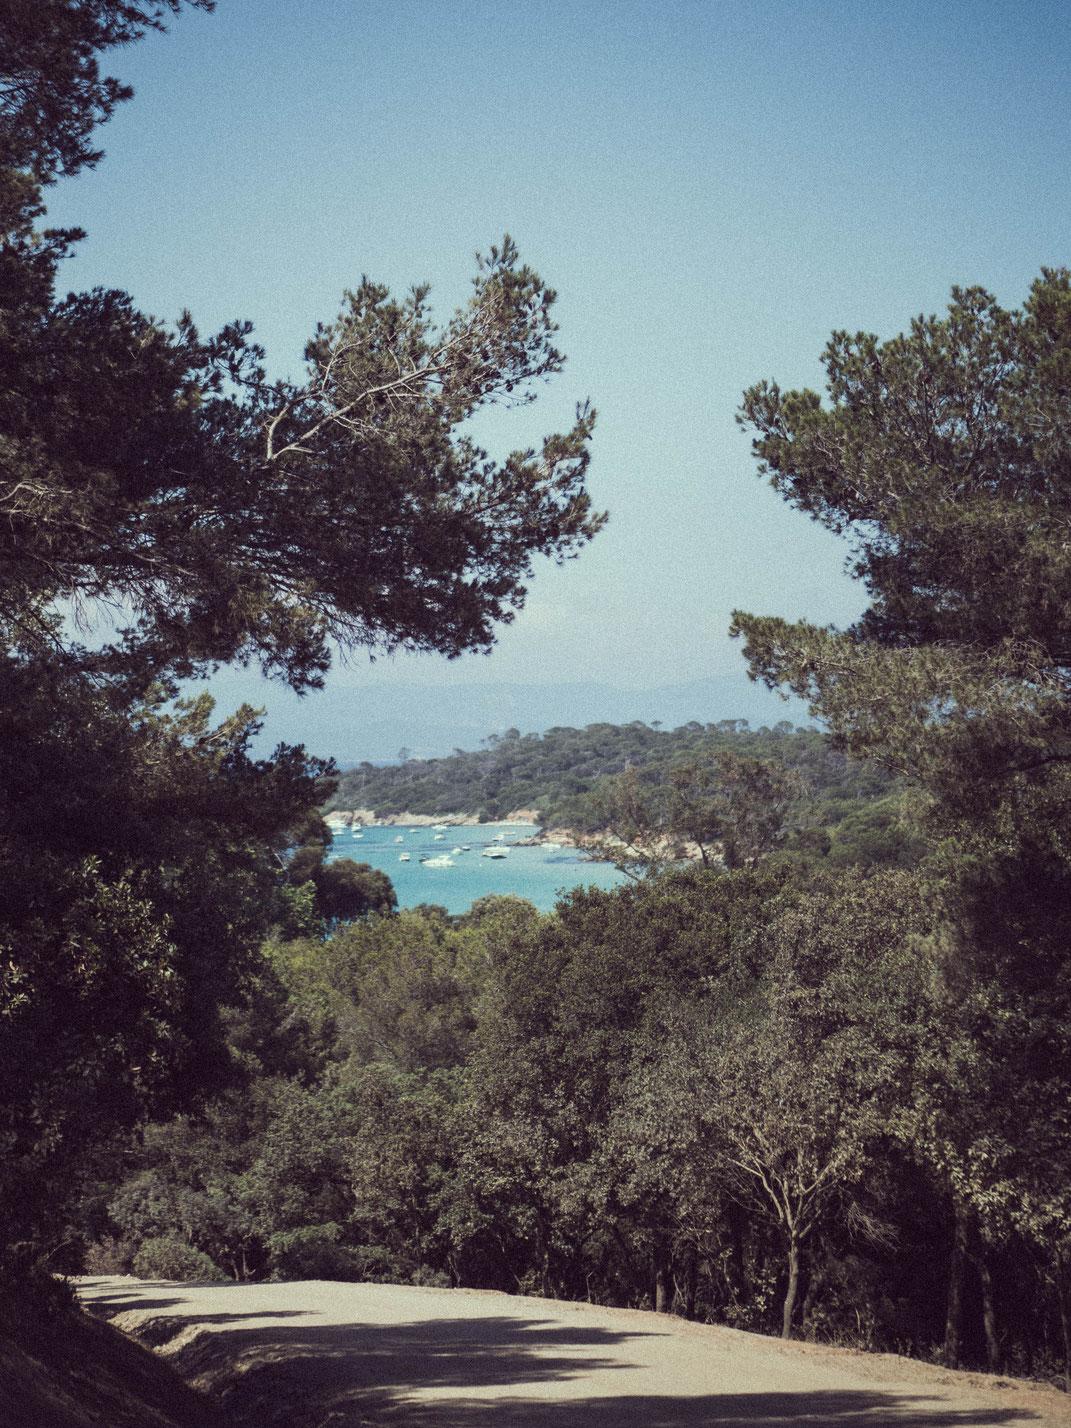 Sud France - Porquerolles